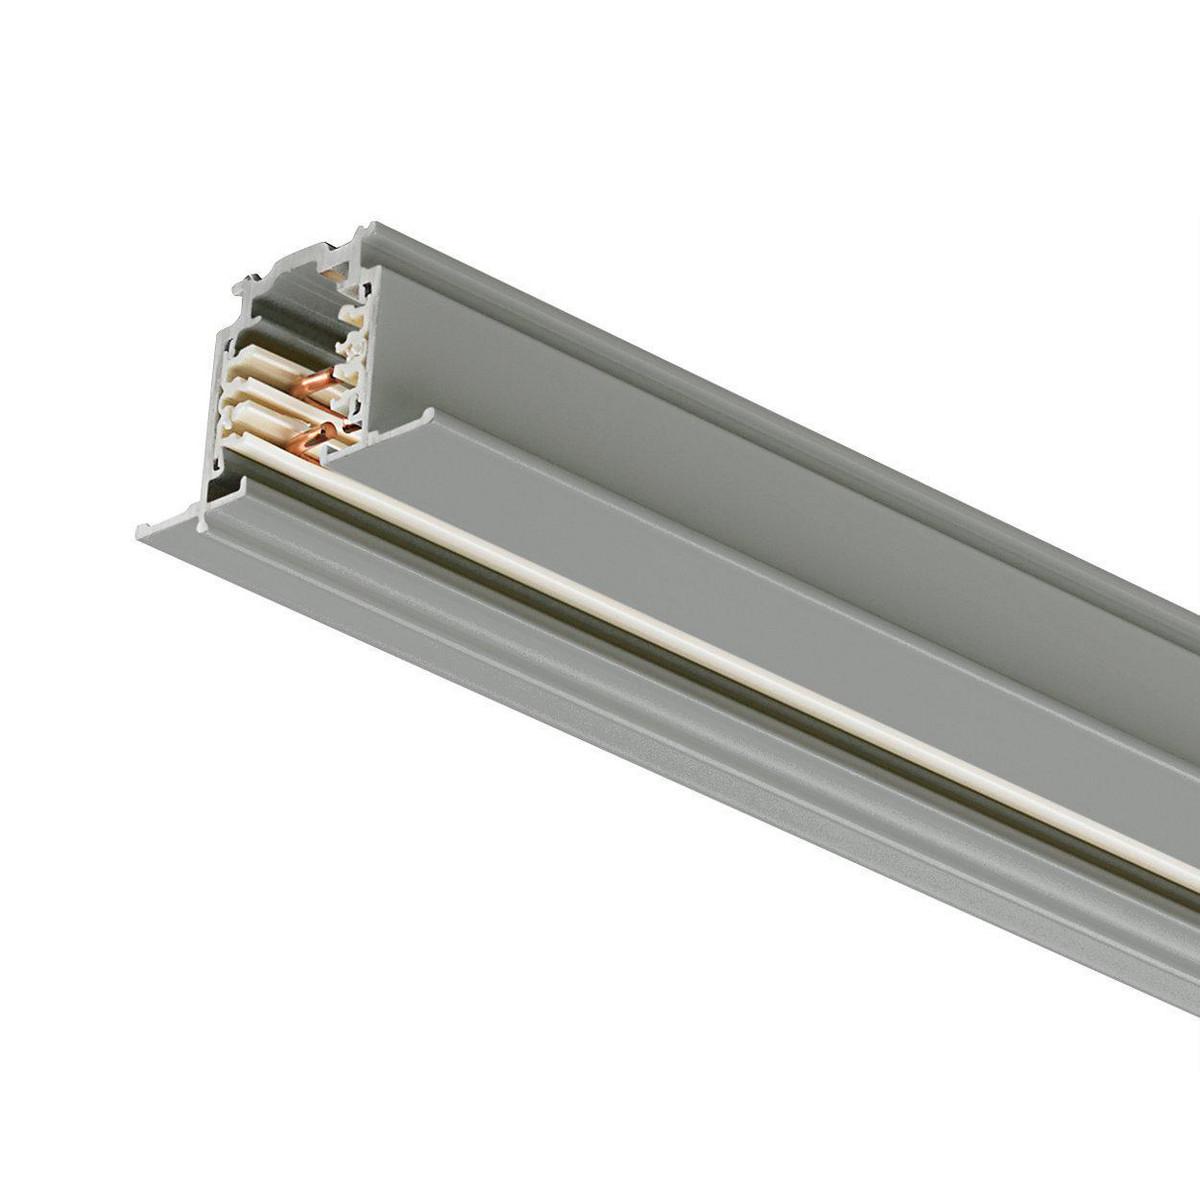 GLOBAL XTSCF6400-1 Strømskinne (Indbyg) DALI 4M Alu